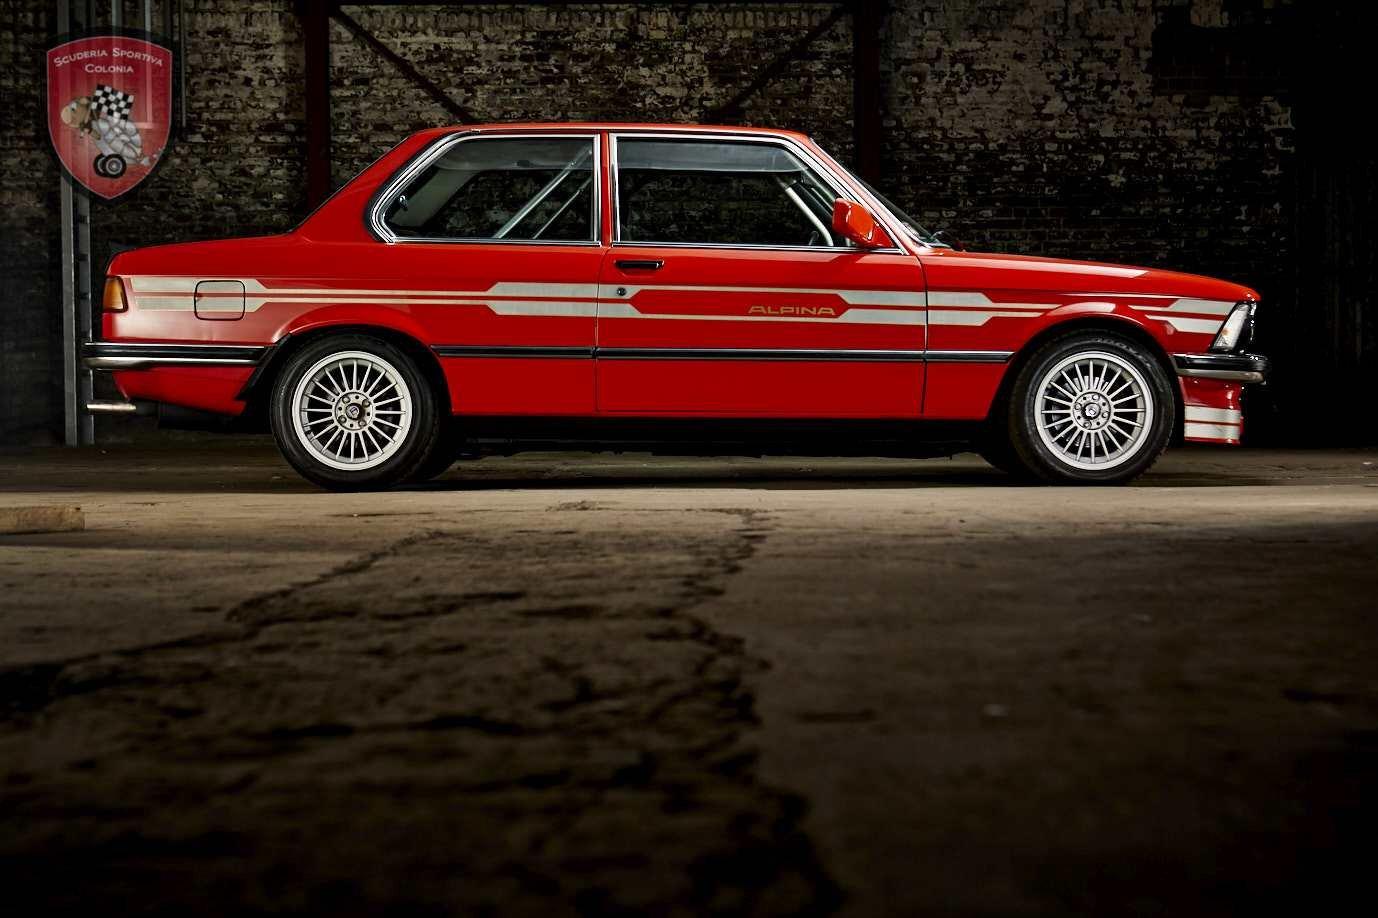 1982 BMW 323 Alpina C1 (E21) For Sale (picture 2 of 6)